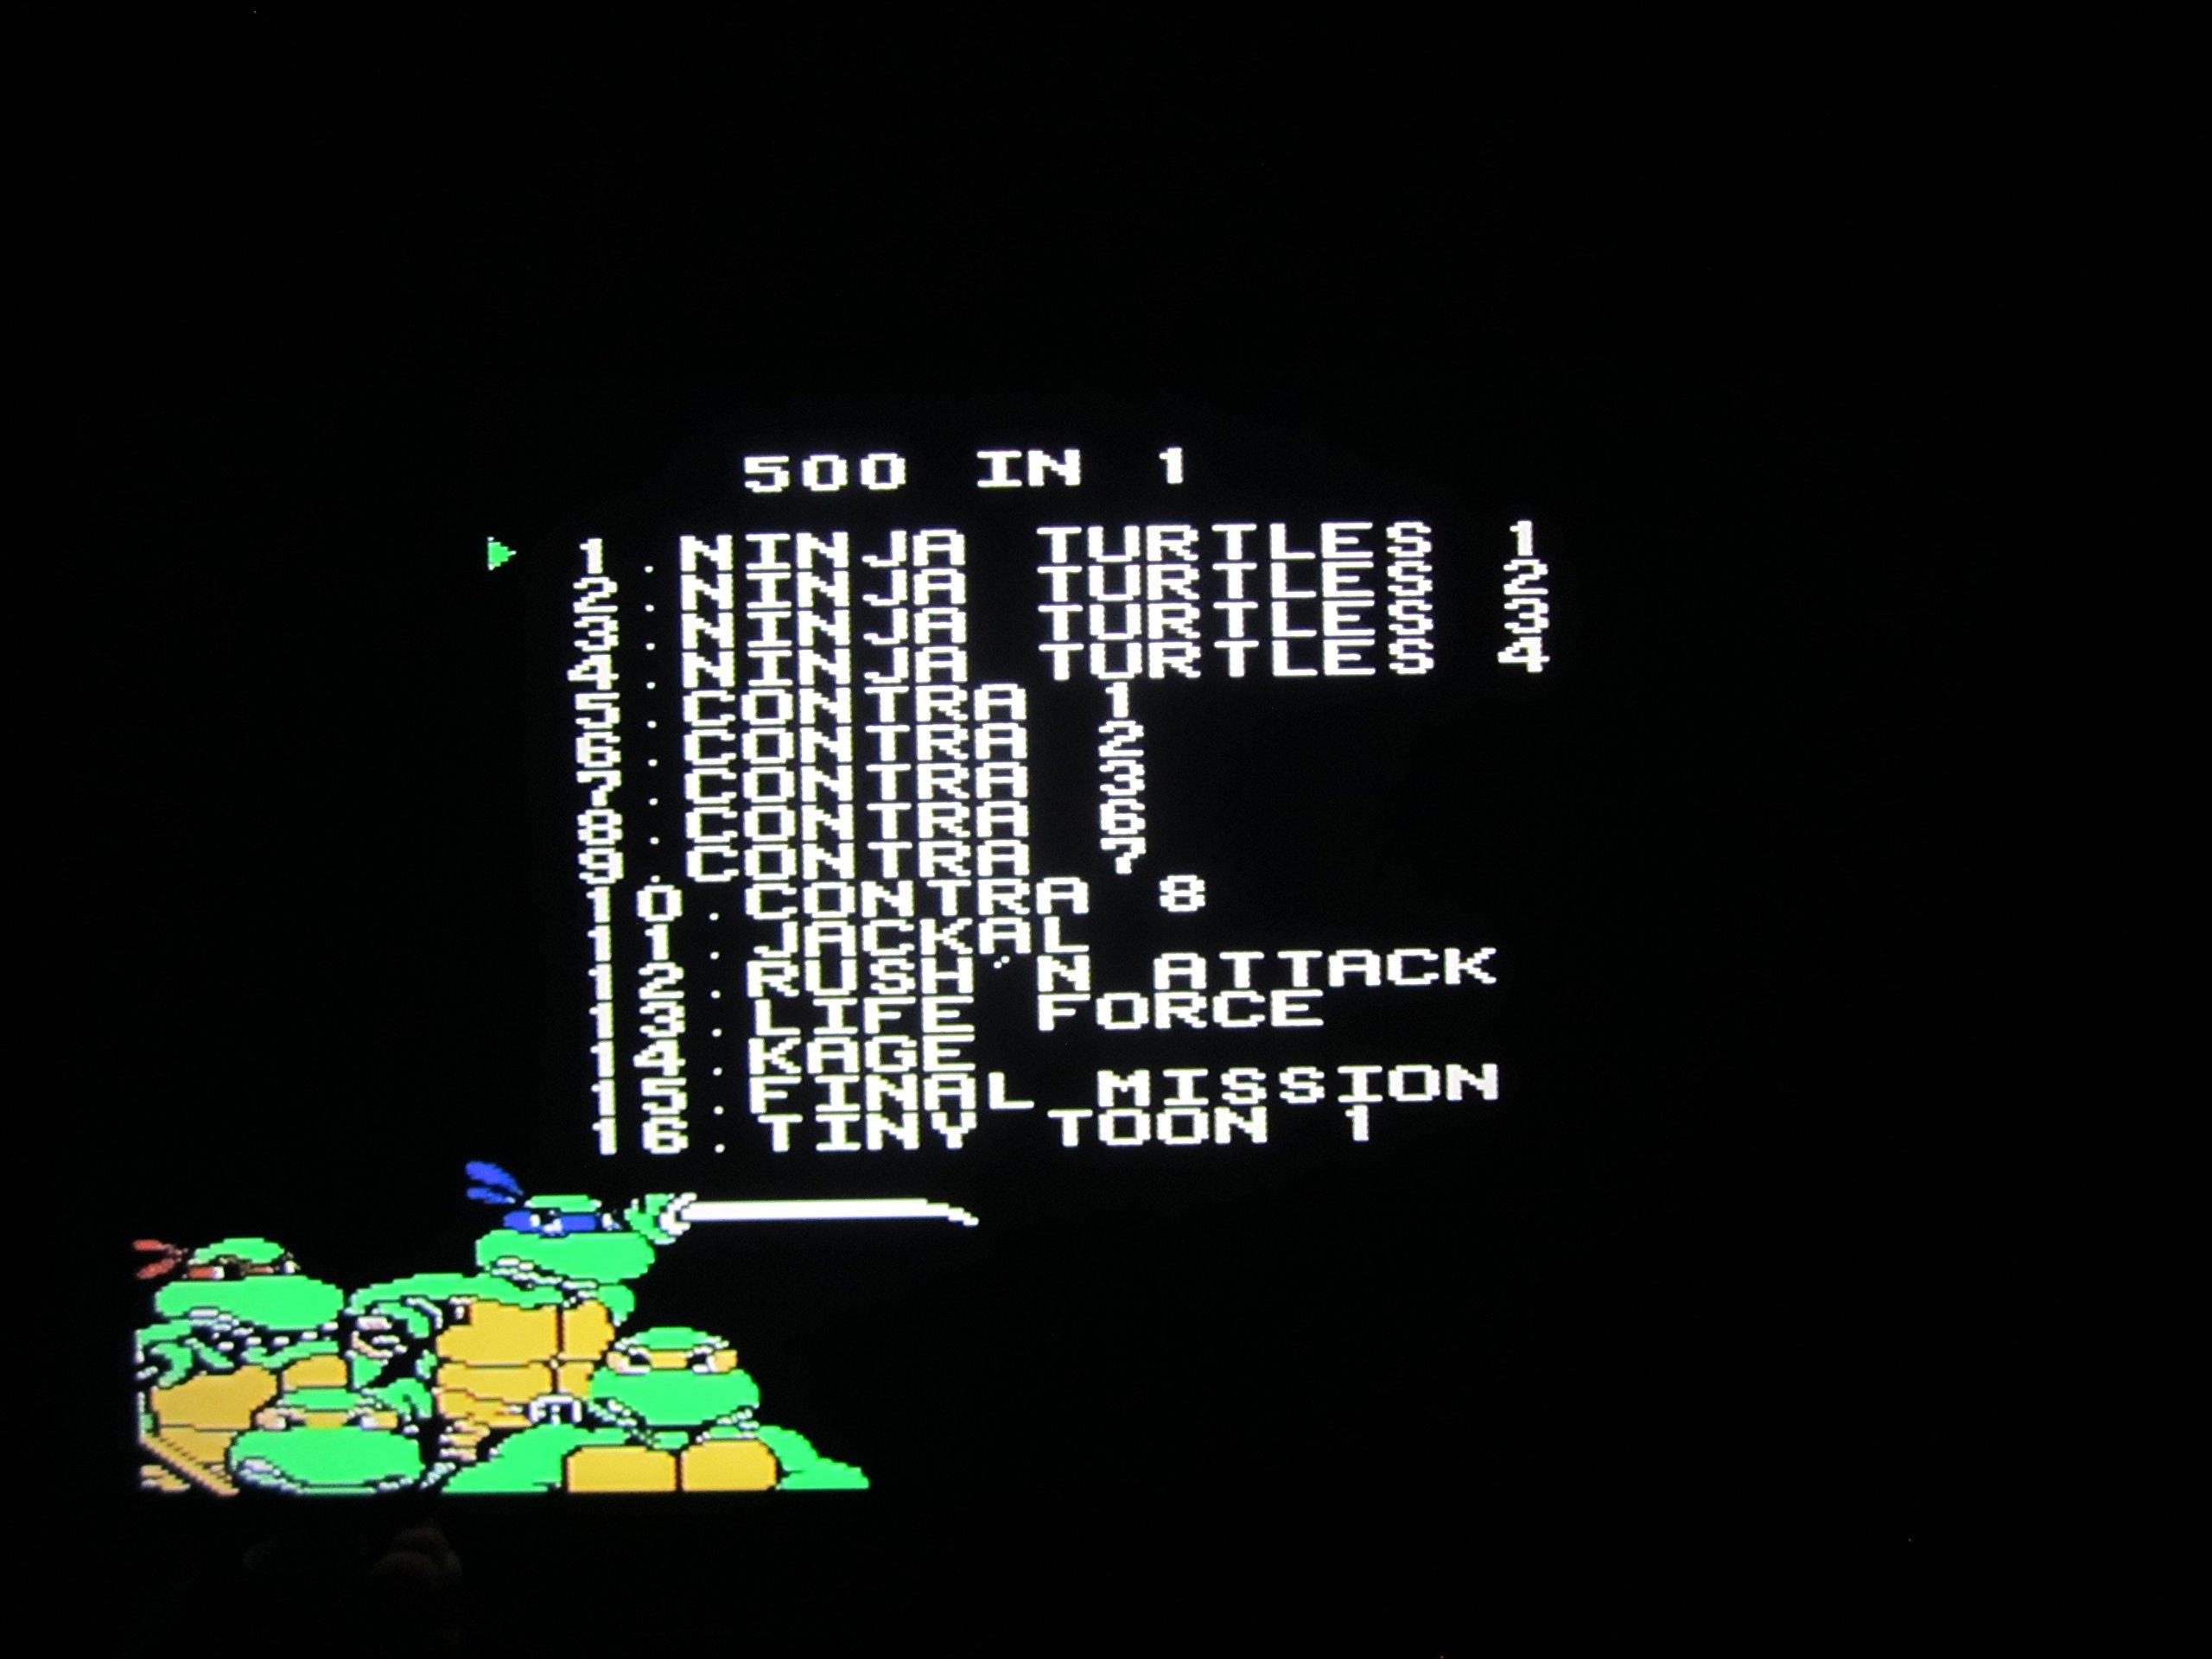 Amazon.com: 500 in 1 Nintendo NES Game Cartridge! Includes Batman ...